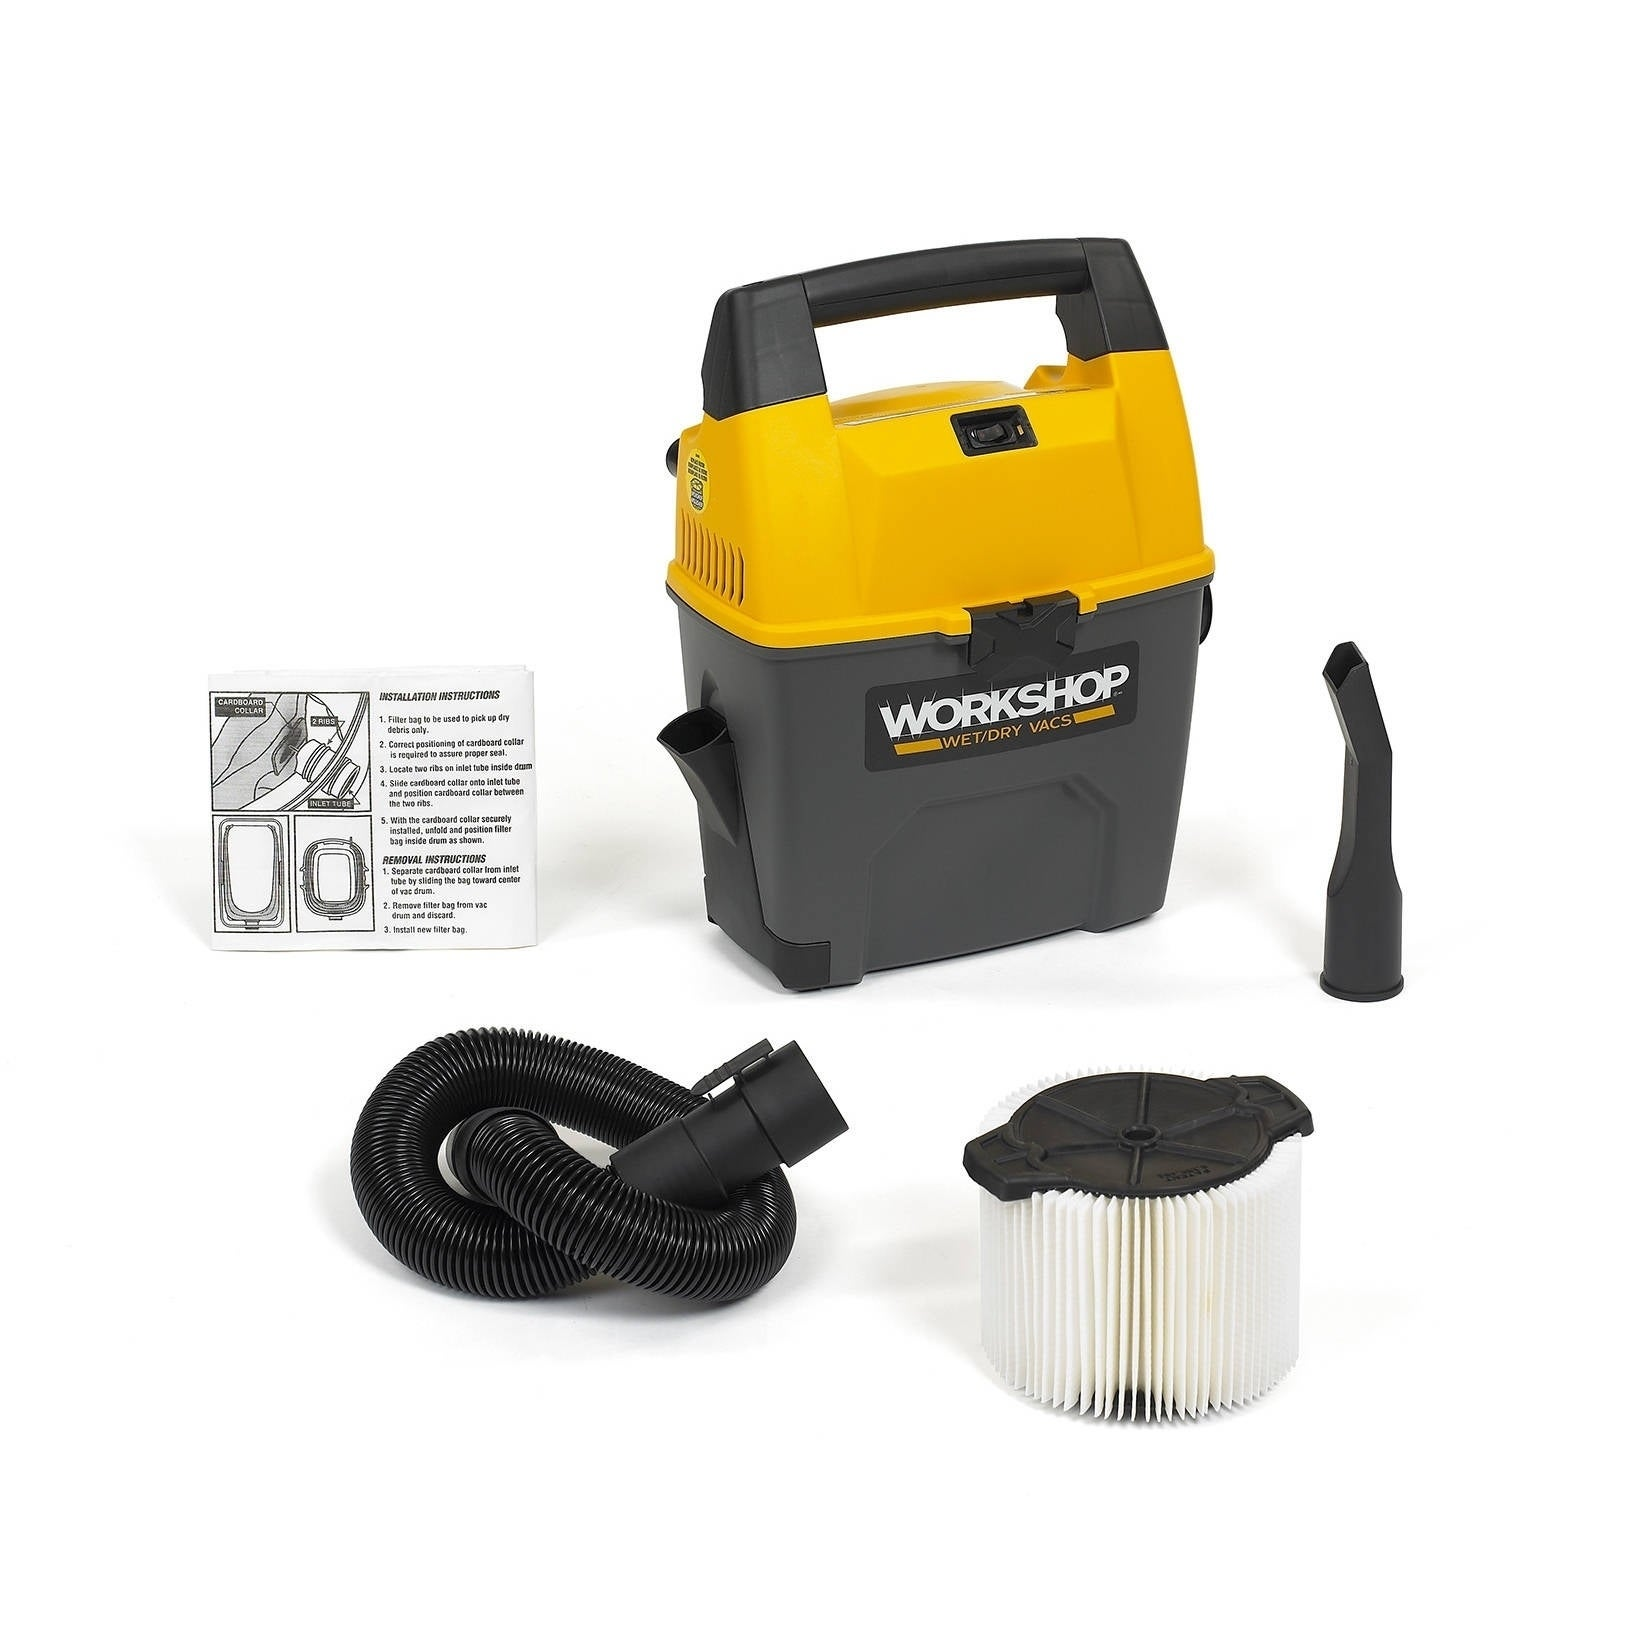 ProTeam WORKSHOP Wet/Dry Vacs 3 Gallon 3.5 Peak HP Portable Wet / Dry Vacuum